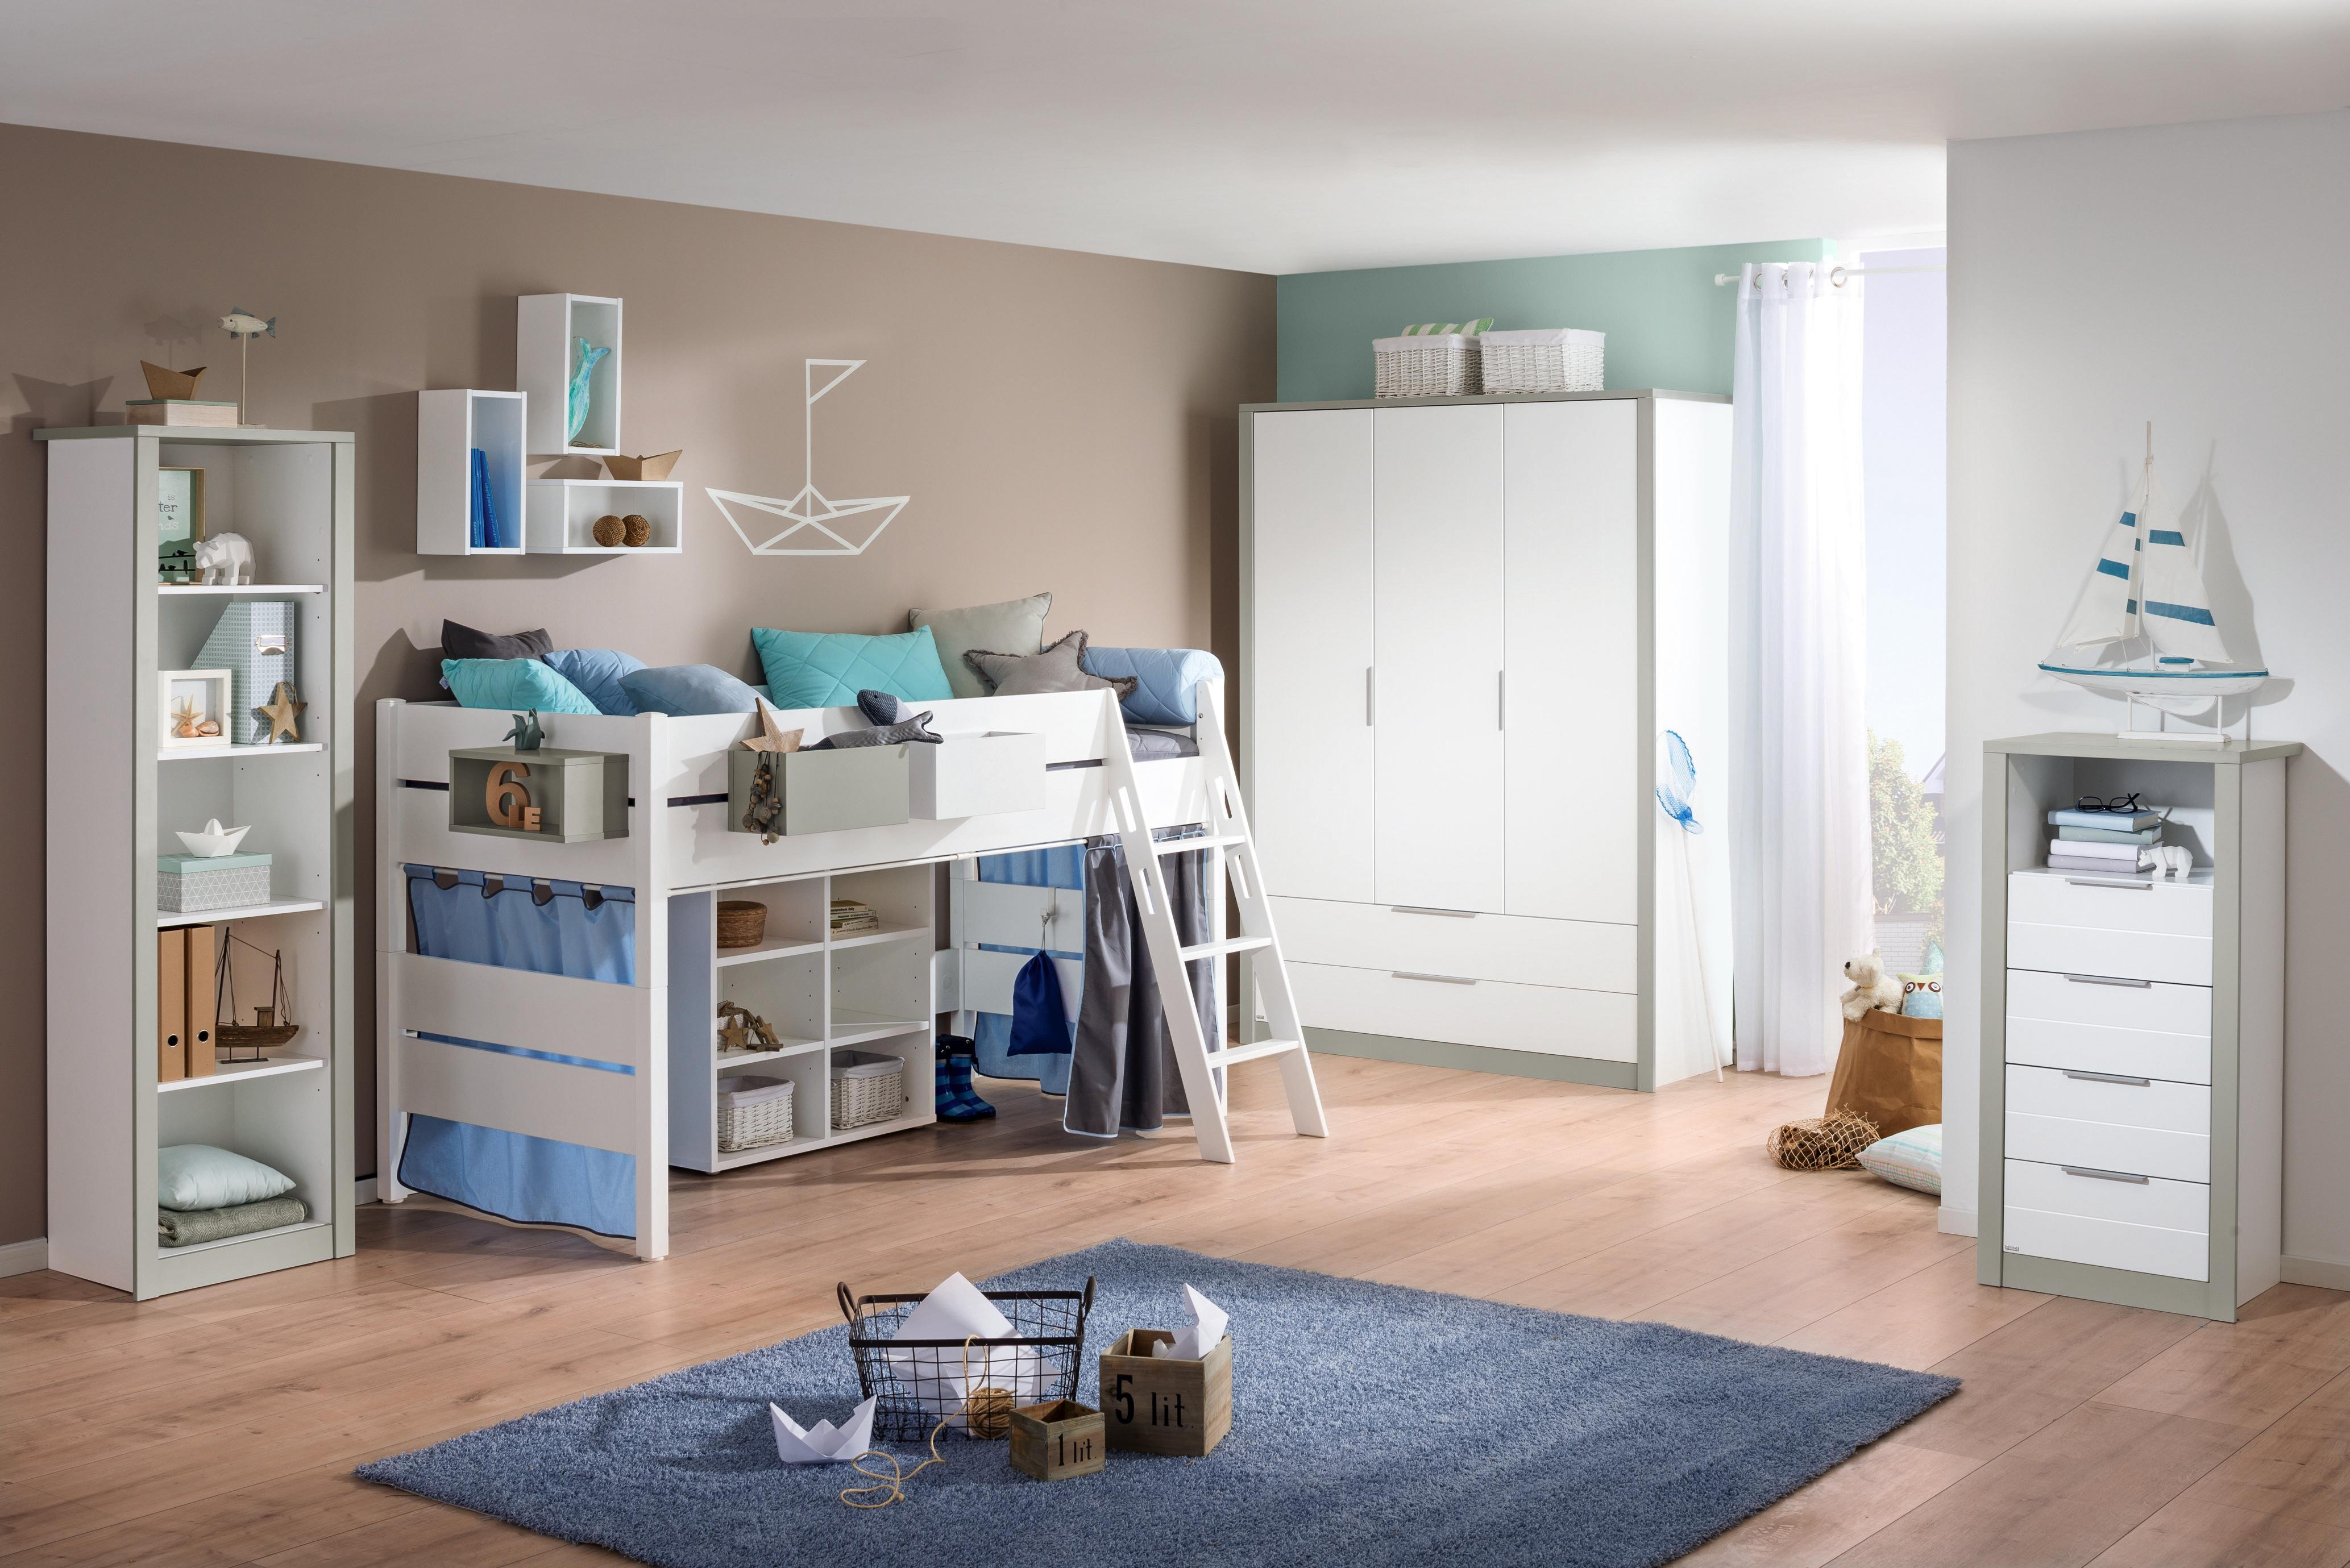 Etagenbett Linea Natura : Hochbetten stockbetten etagenbetten für kinder ▷ xxxlutz